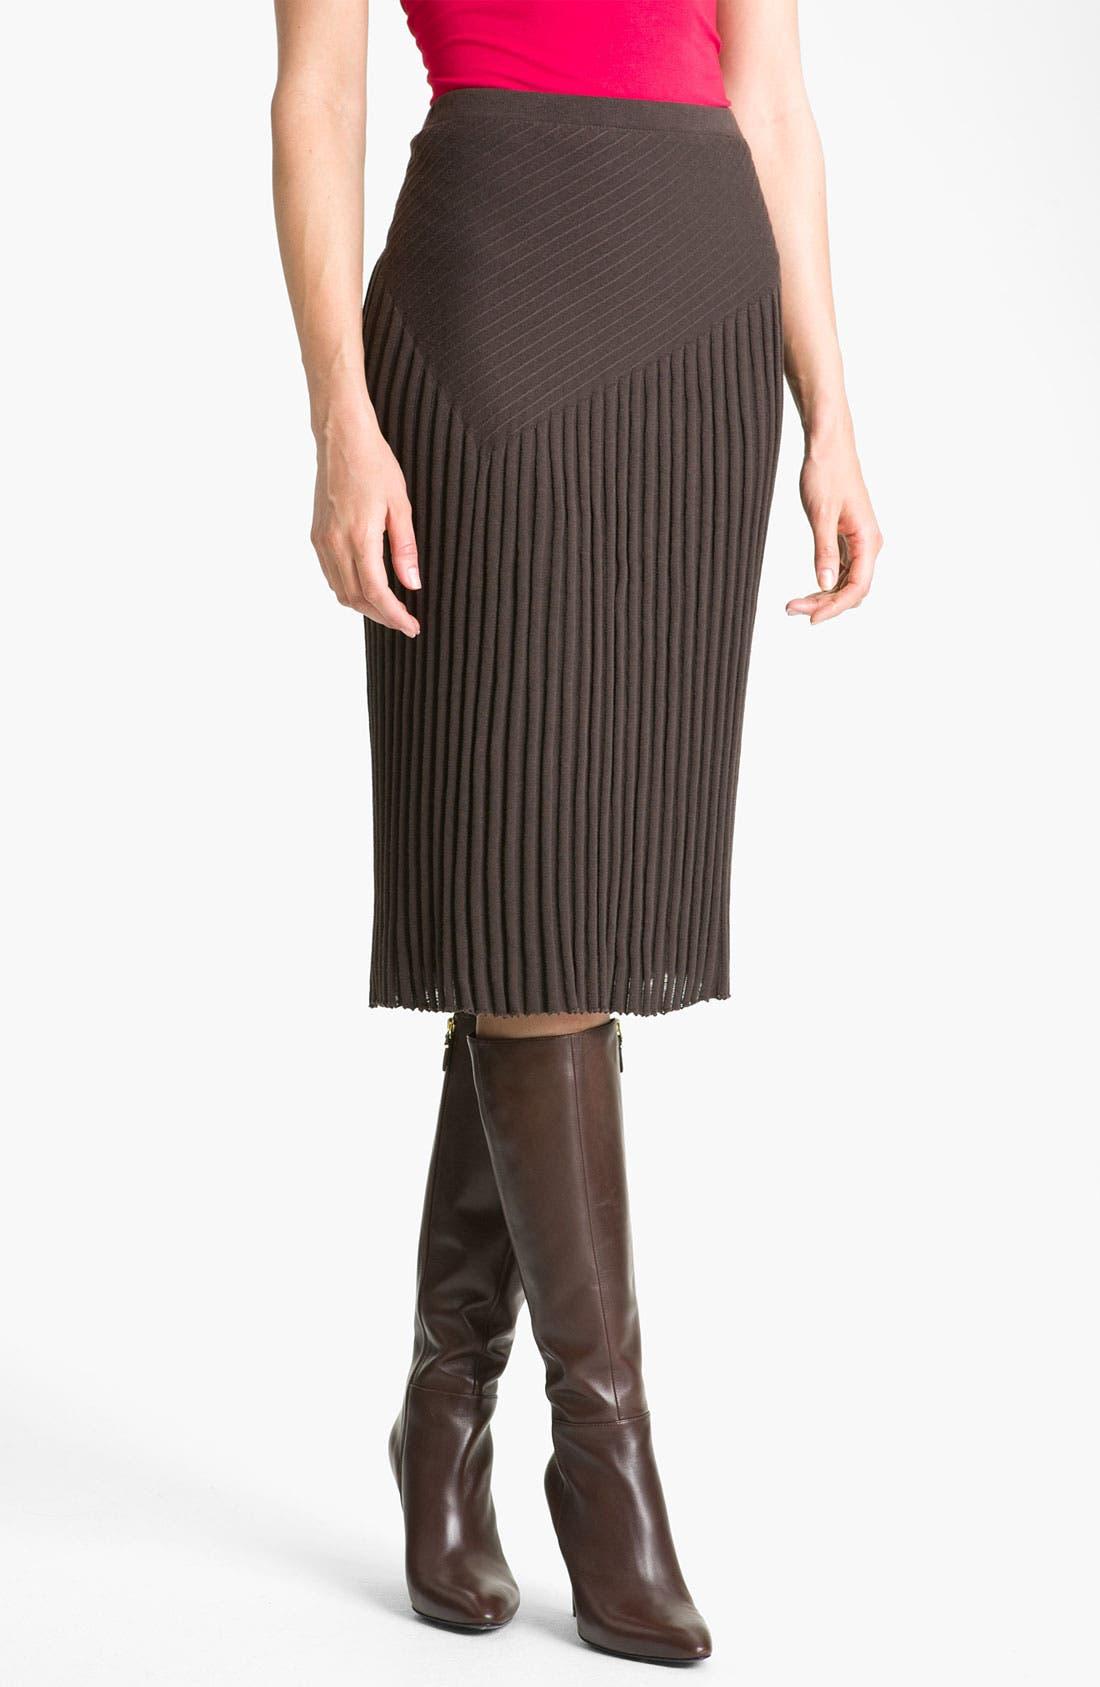 Alternate Image 1 Selected - Nic + Zoe Pleated Knit Skirt